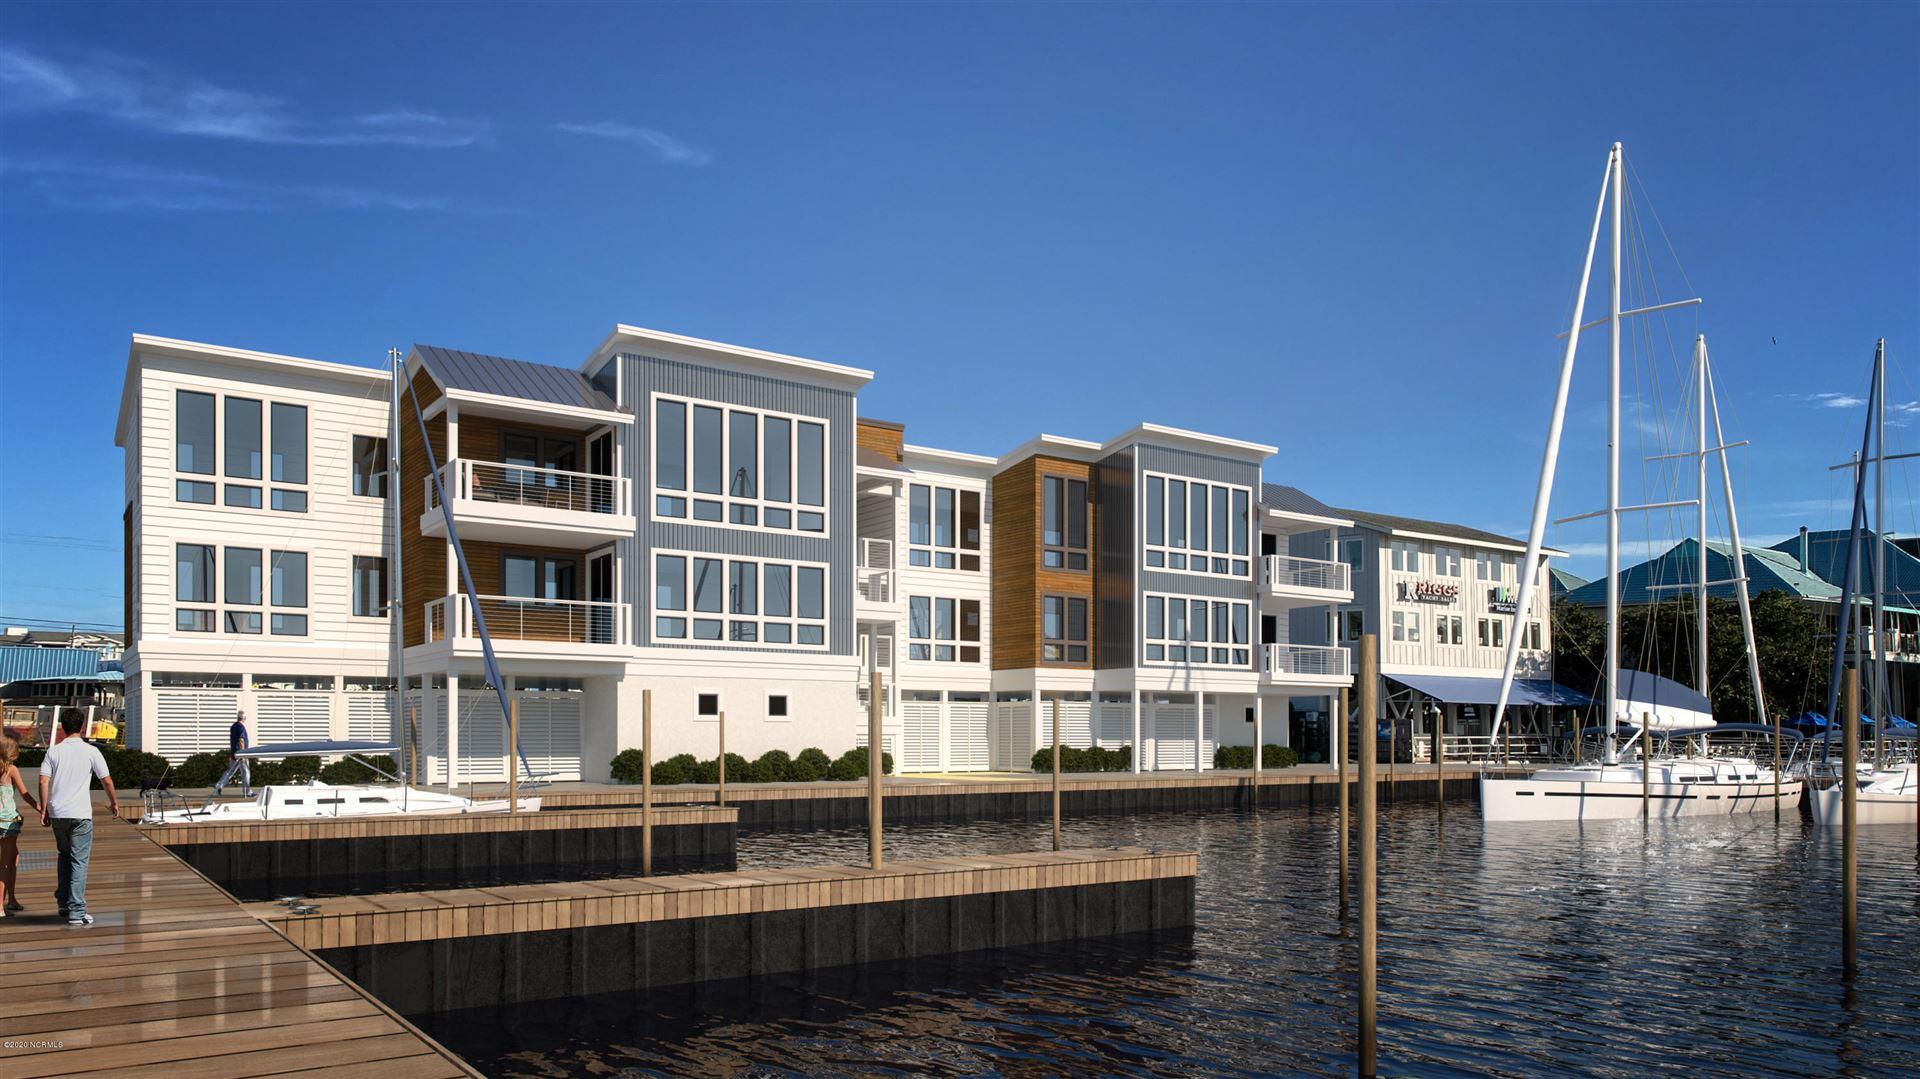 Photo of 2 Marina Street #A, Wrightsville Beach, NC 28480 (MLS # 100217652)